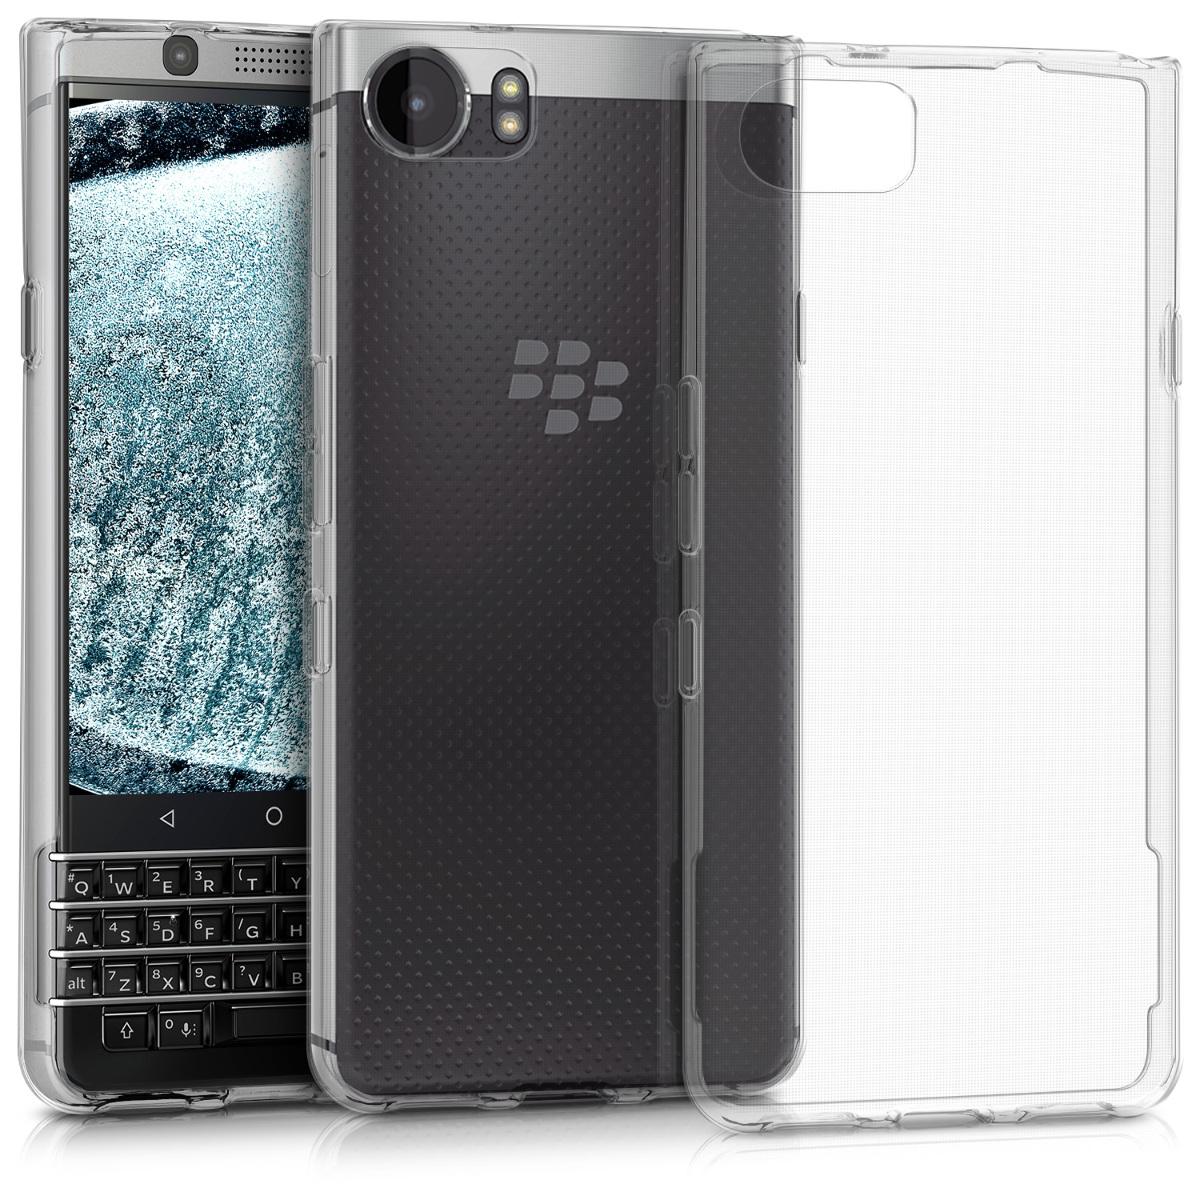 Hulle-fur-Blackberry-KEYone-Key1-Handyhulle-Handy-Case-Cover-klar-Smartphone